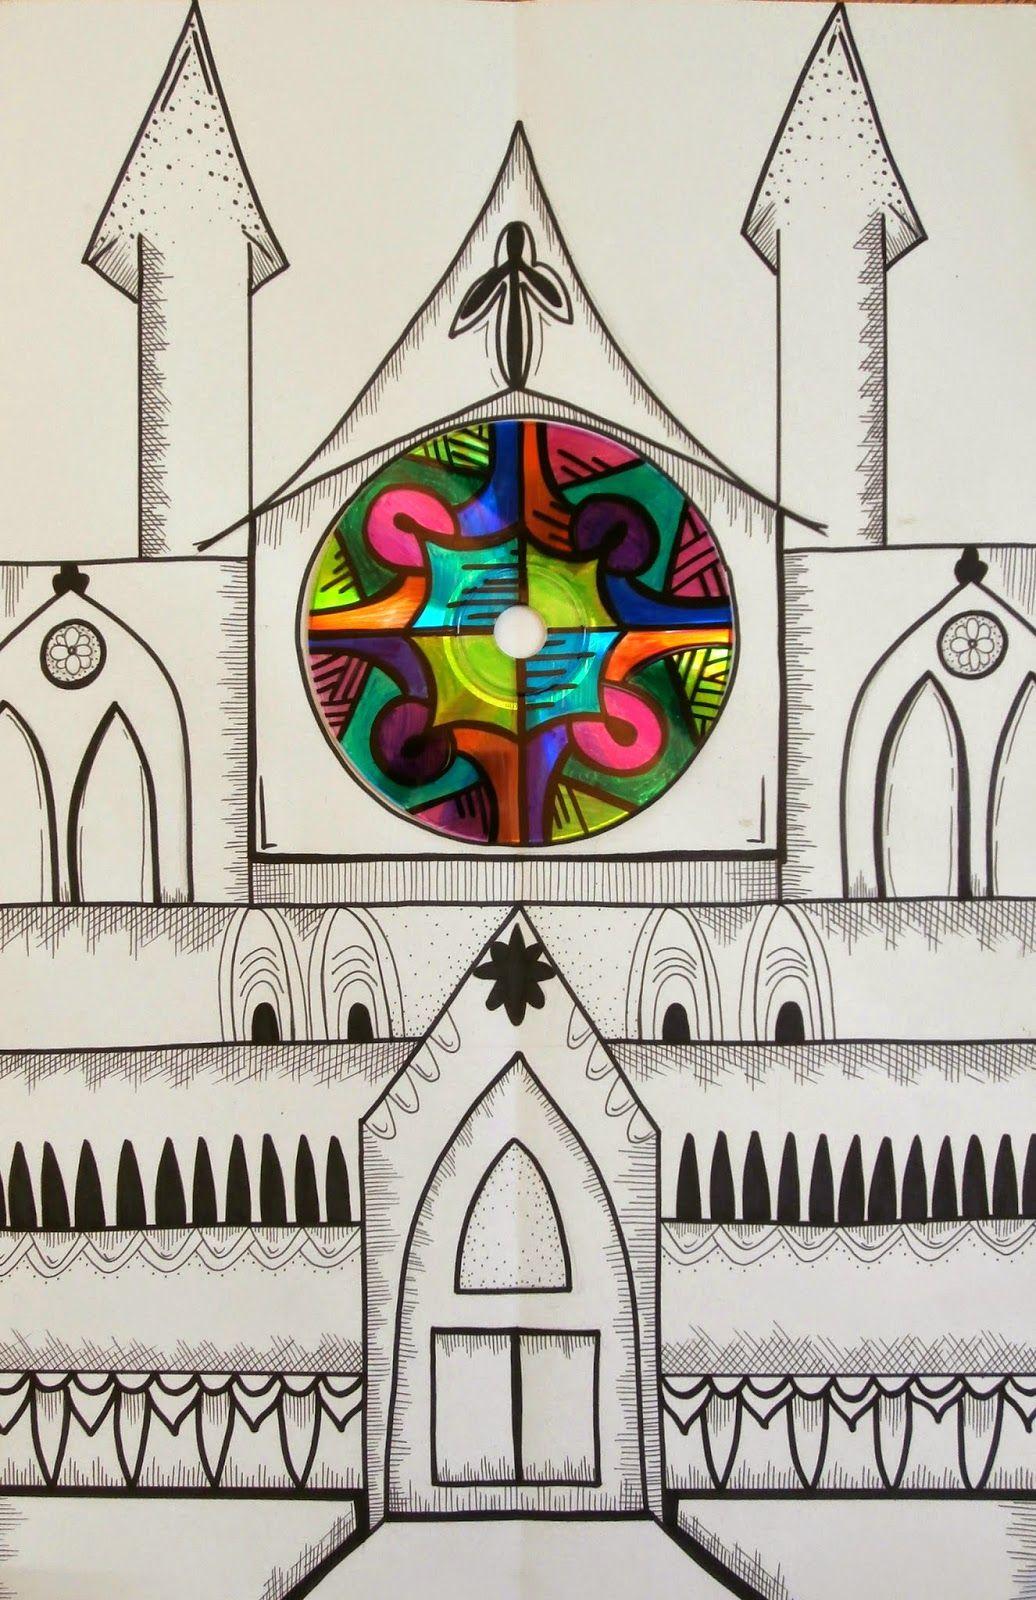 Romanesque And Gothic Architecture